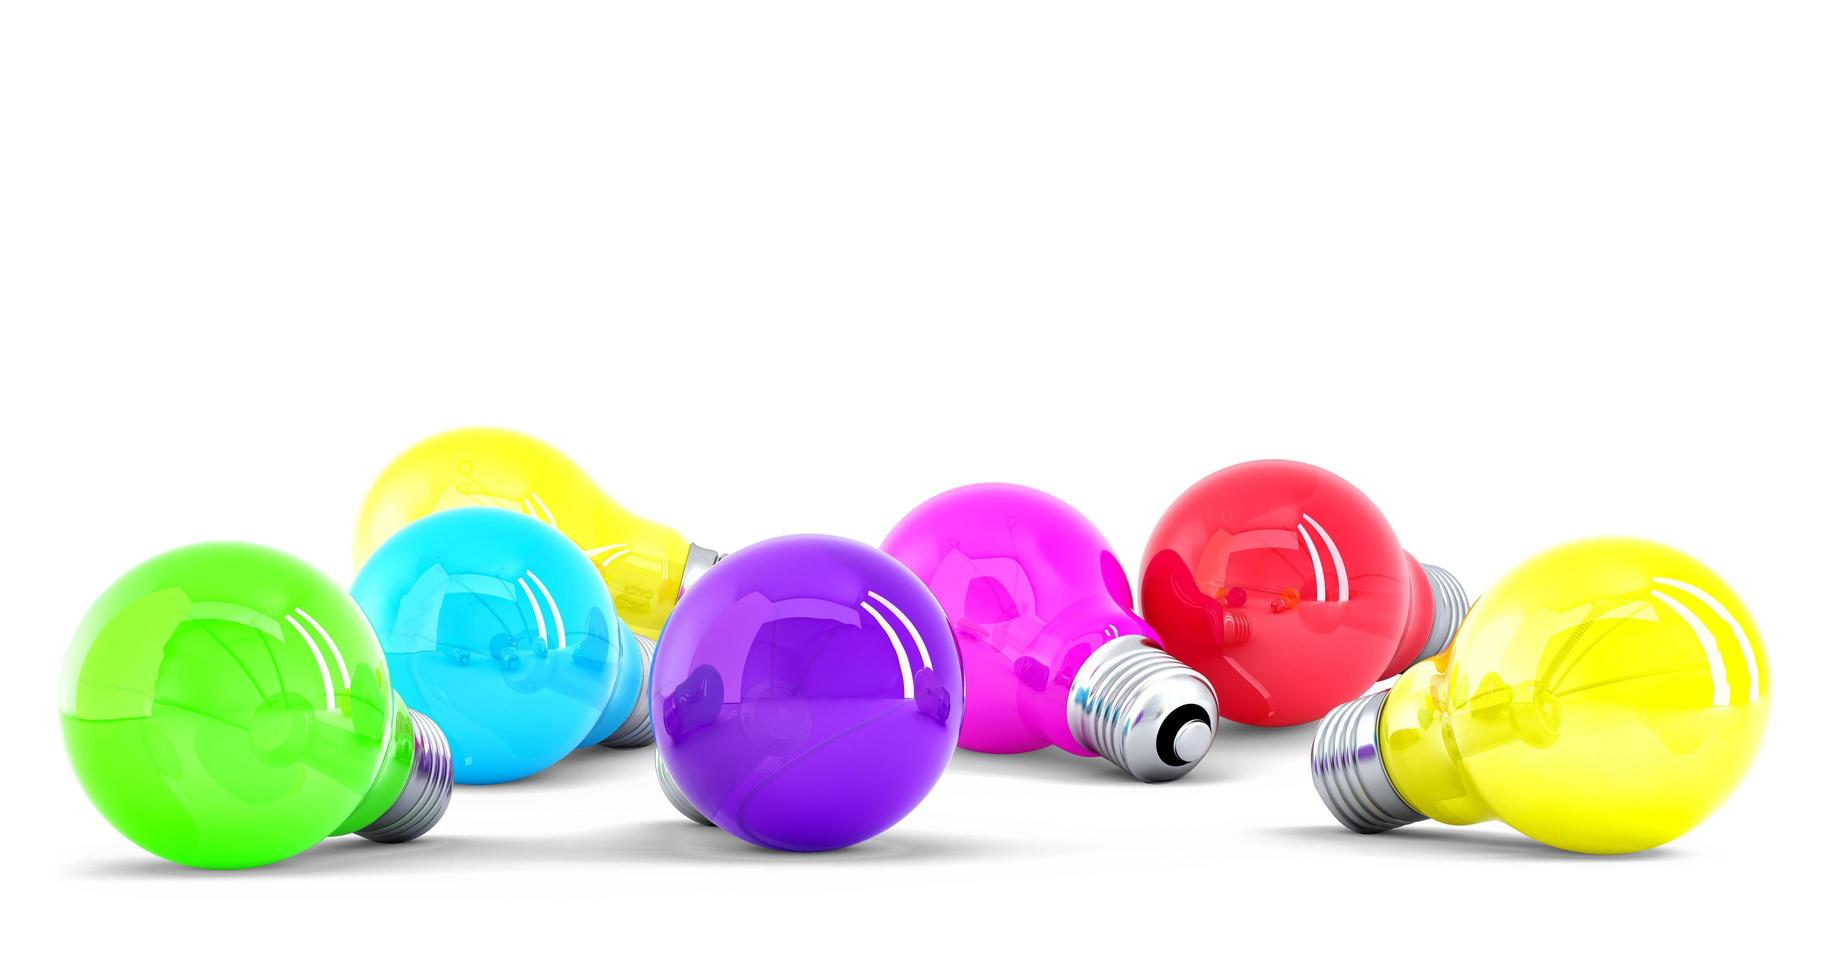 lâmpadas coloridas isoladas no fundo branco foto